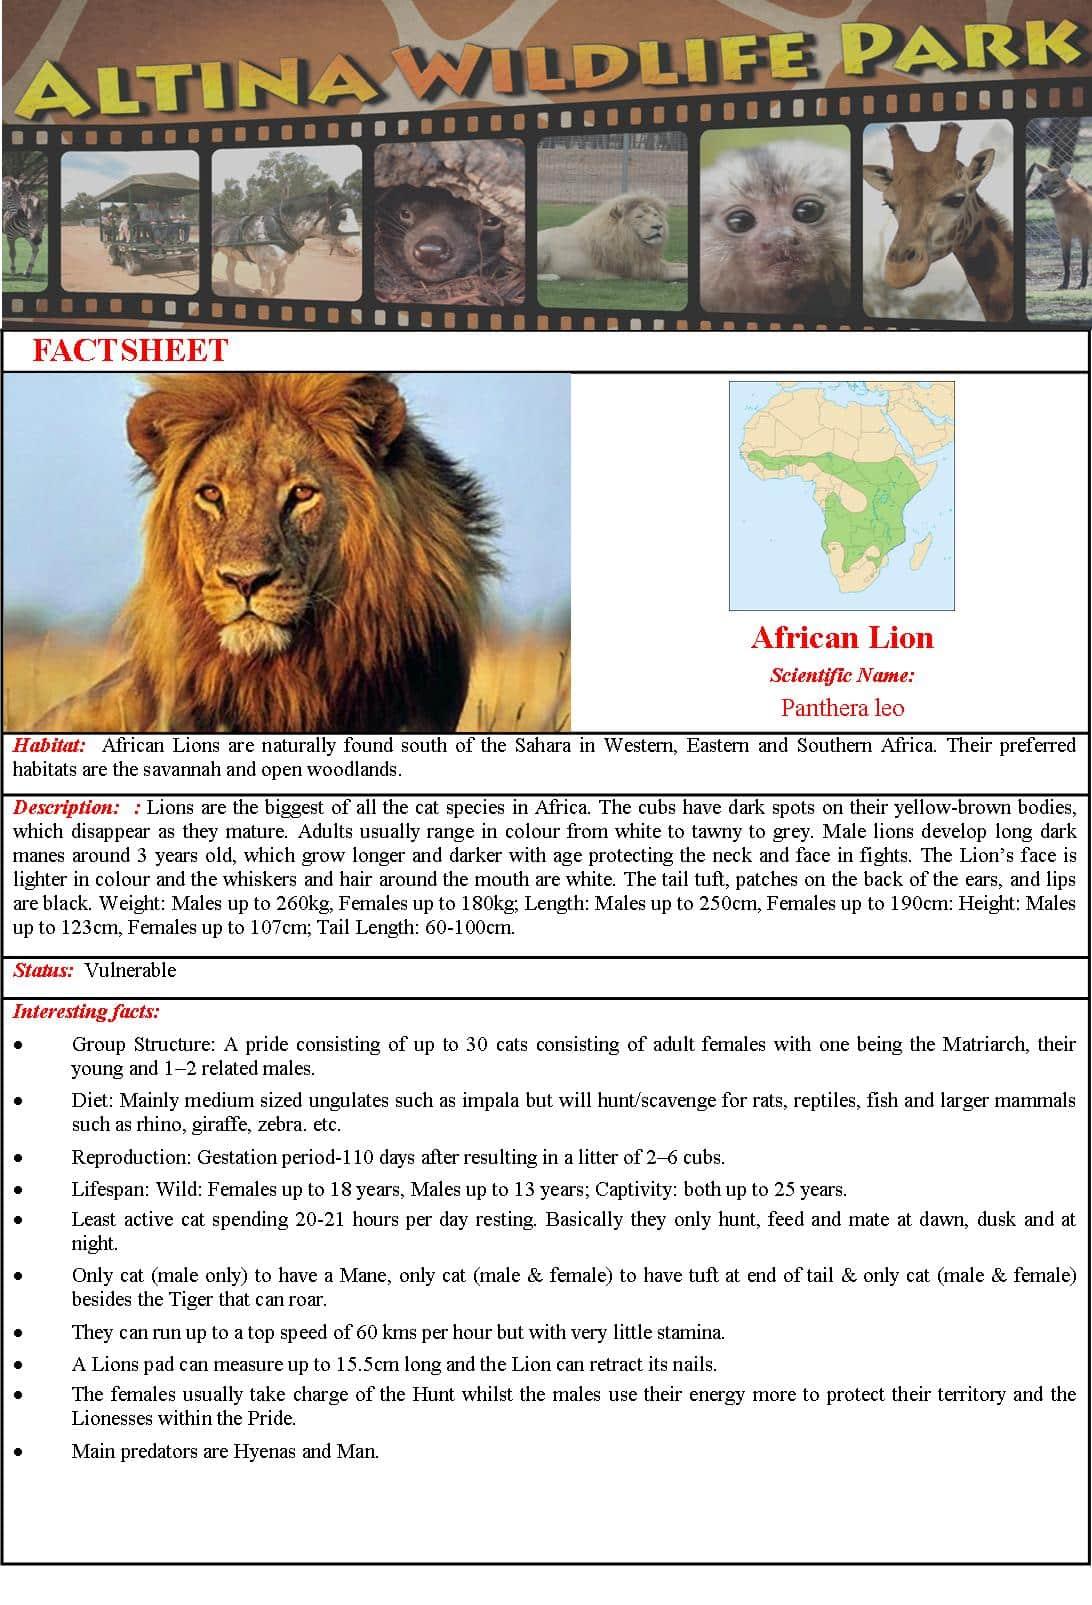 Africanlionfactsheet